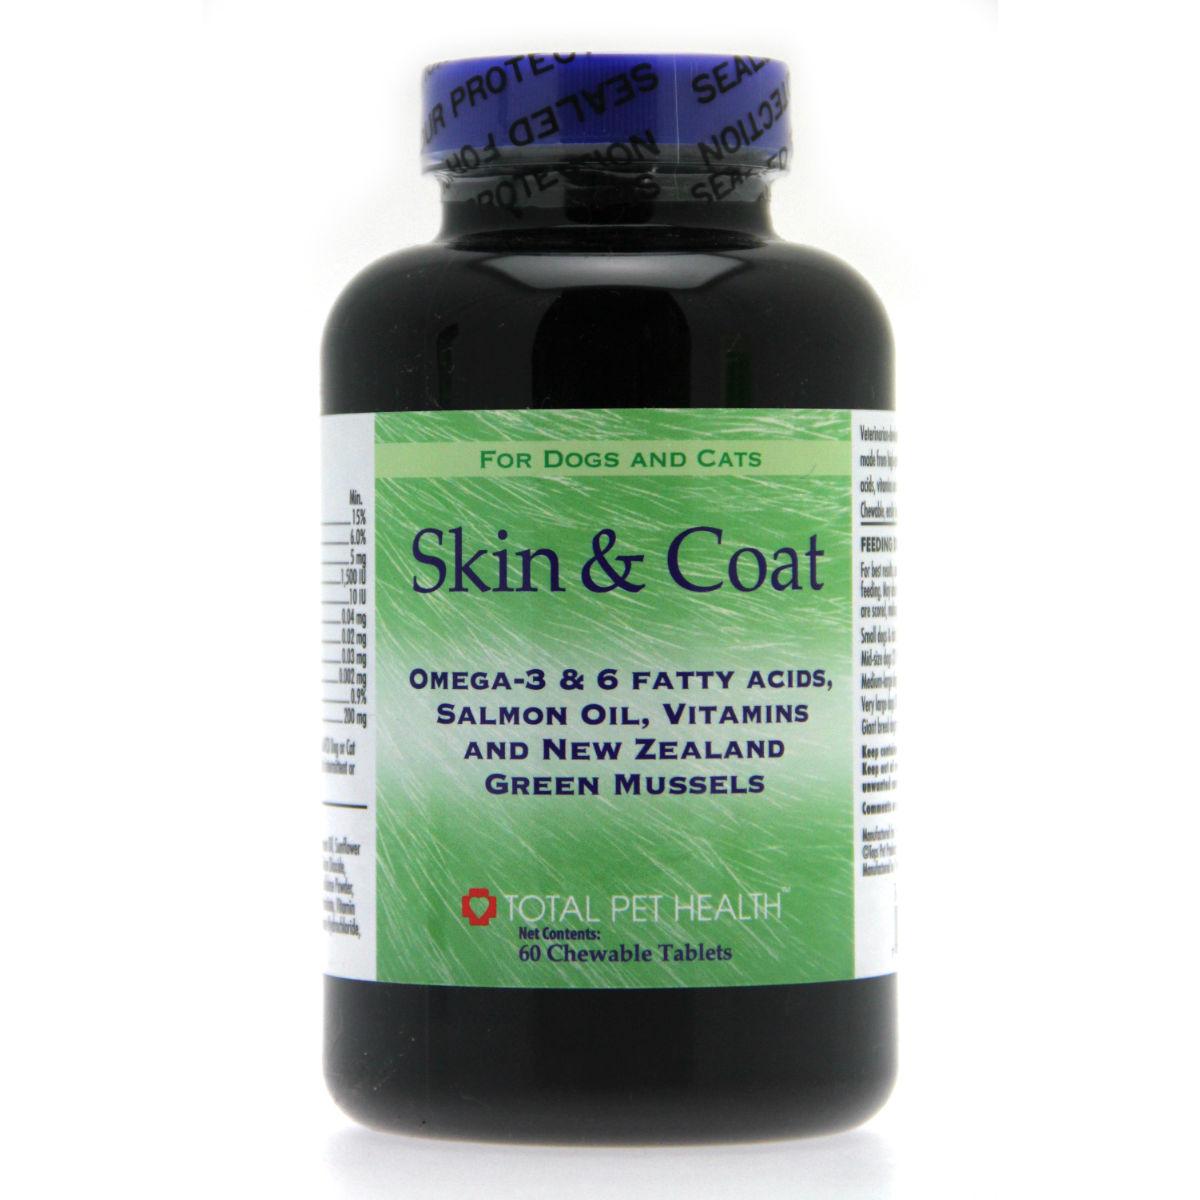 Total Pet Health Skin & Coat Tablets